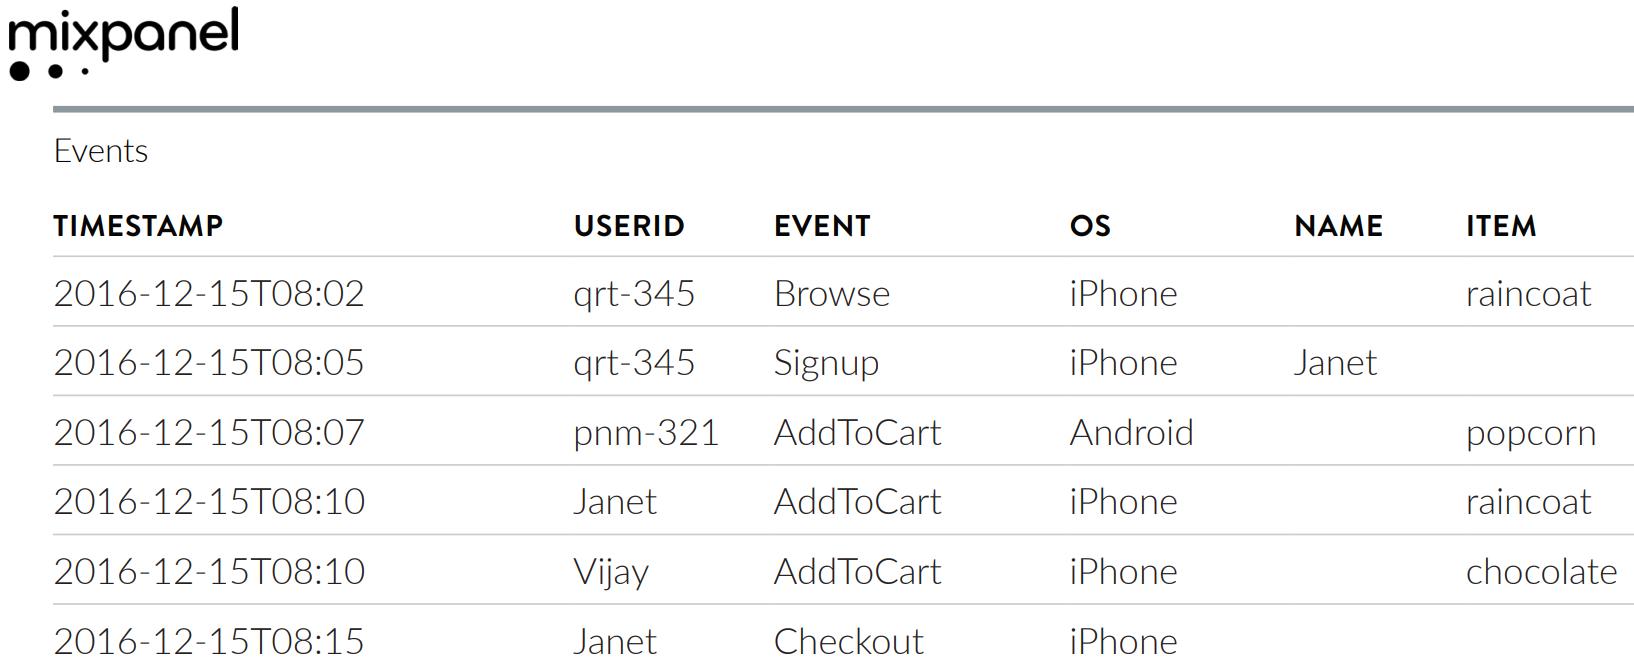 Mixpanel event log demo